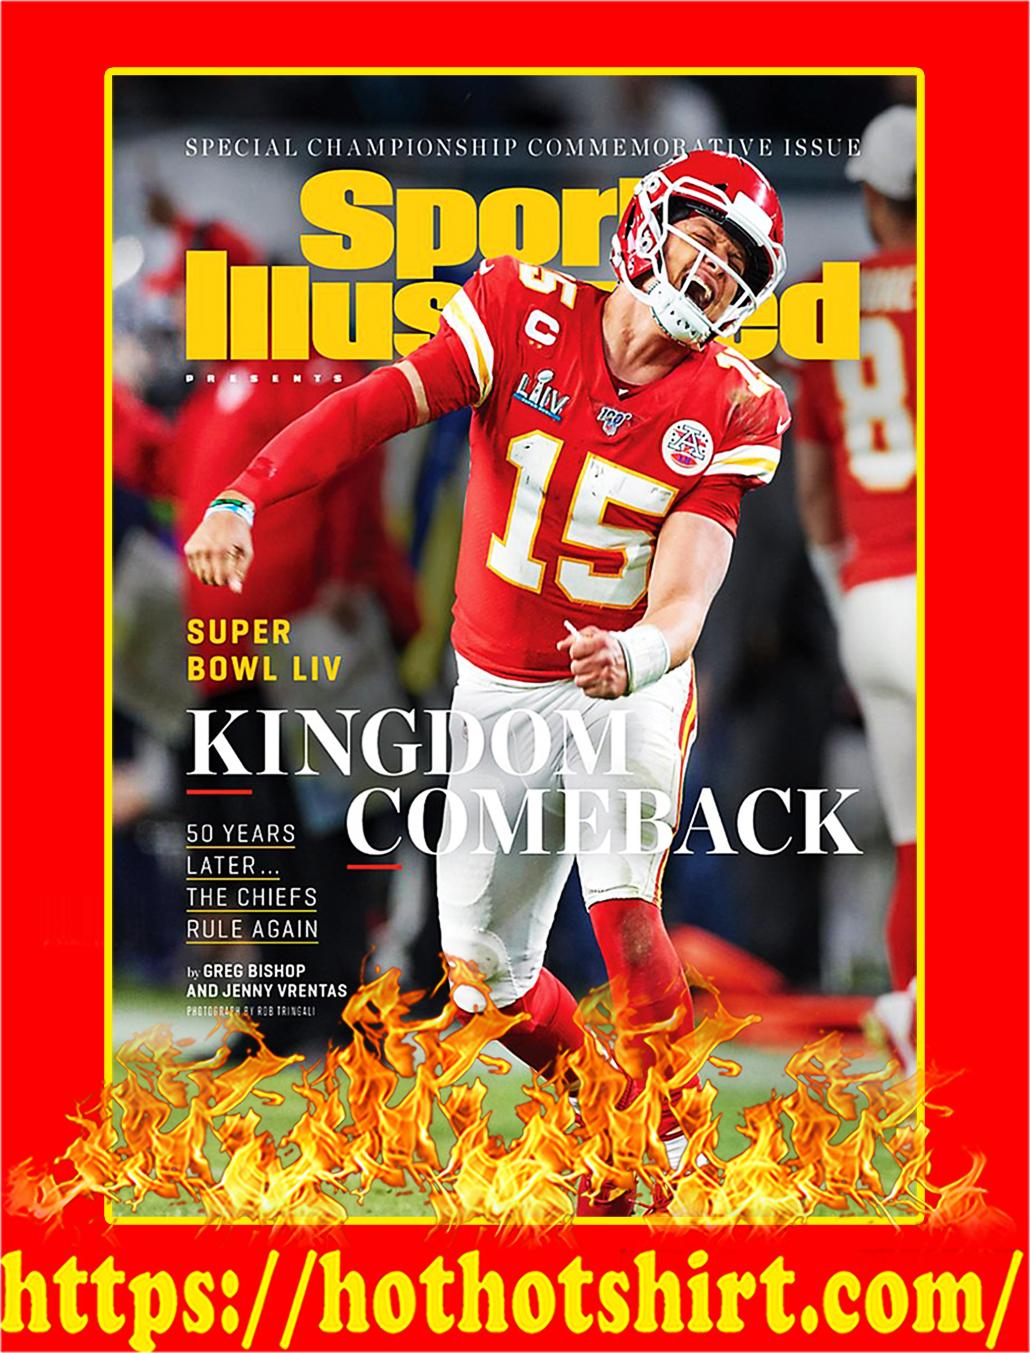 Super Bowl LIV Kingdom Comback Chiefs Poster - A3